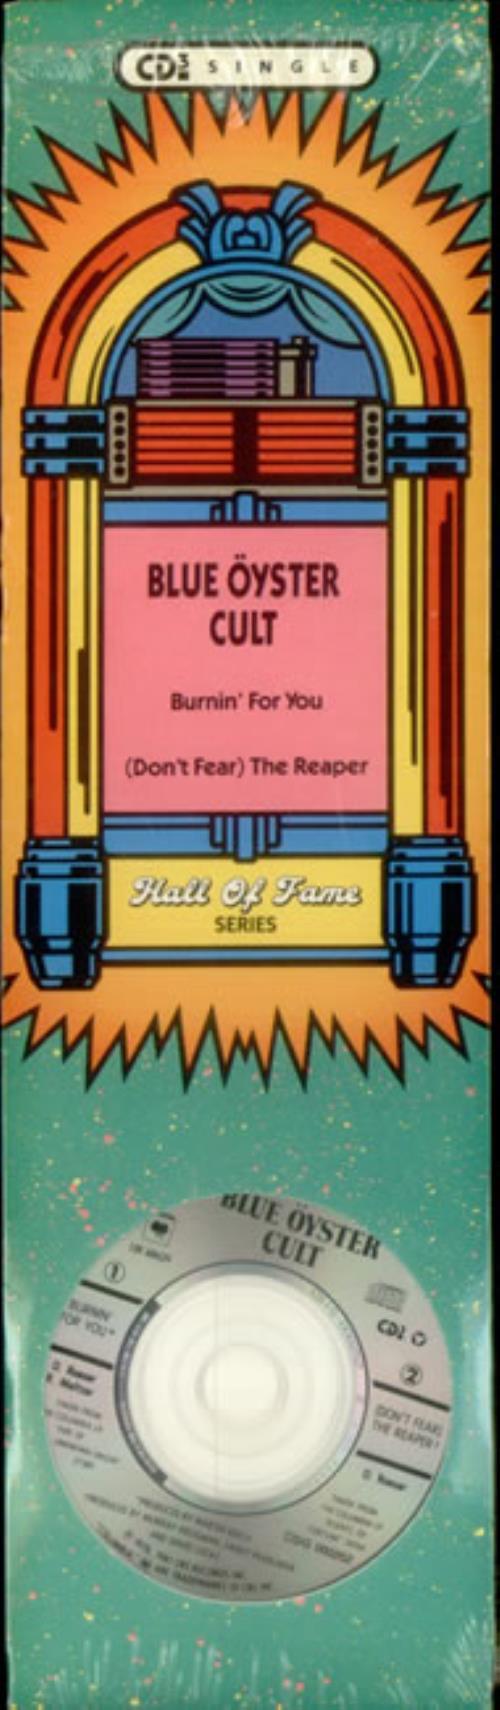 Blue Oyster Cult - Burnin' For You - Sealed